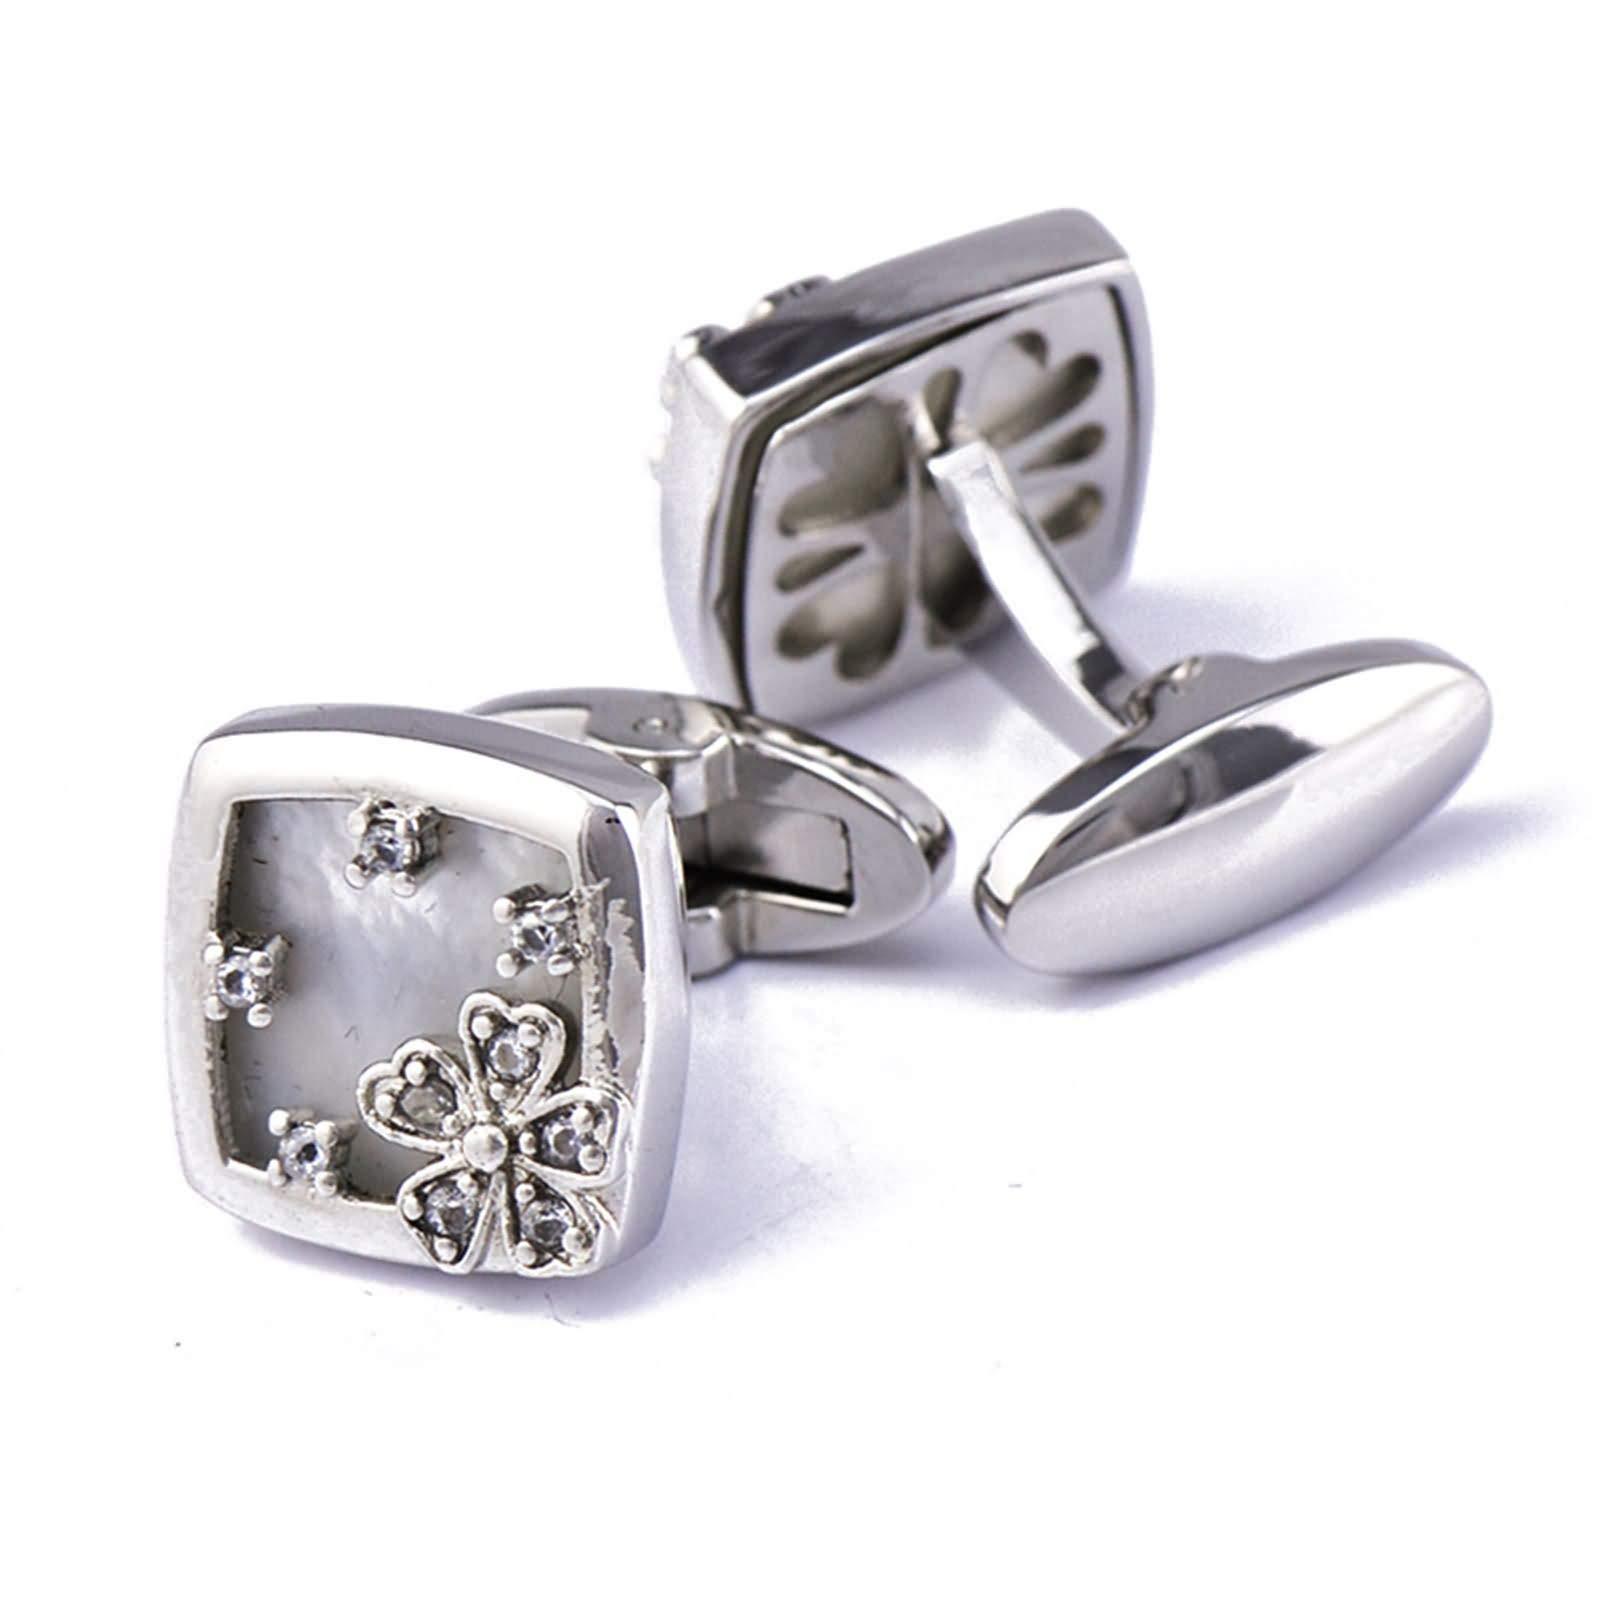 Daesar Copper Cuff Links Cufflinks Wedding Groom Flower Square Cubic Zirconia White Cuff Link Silver